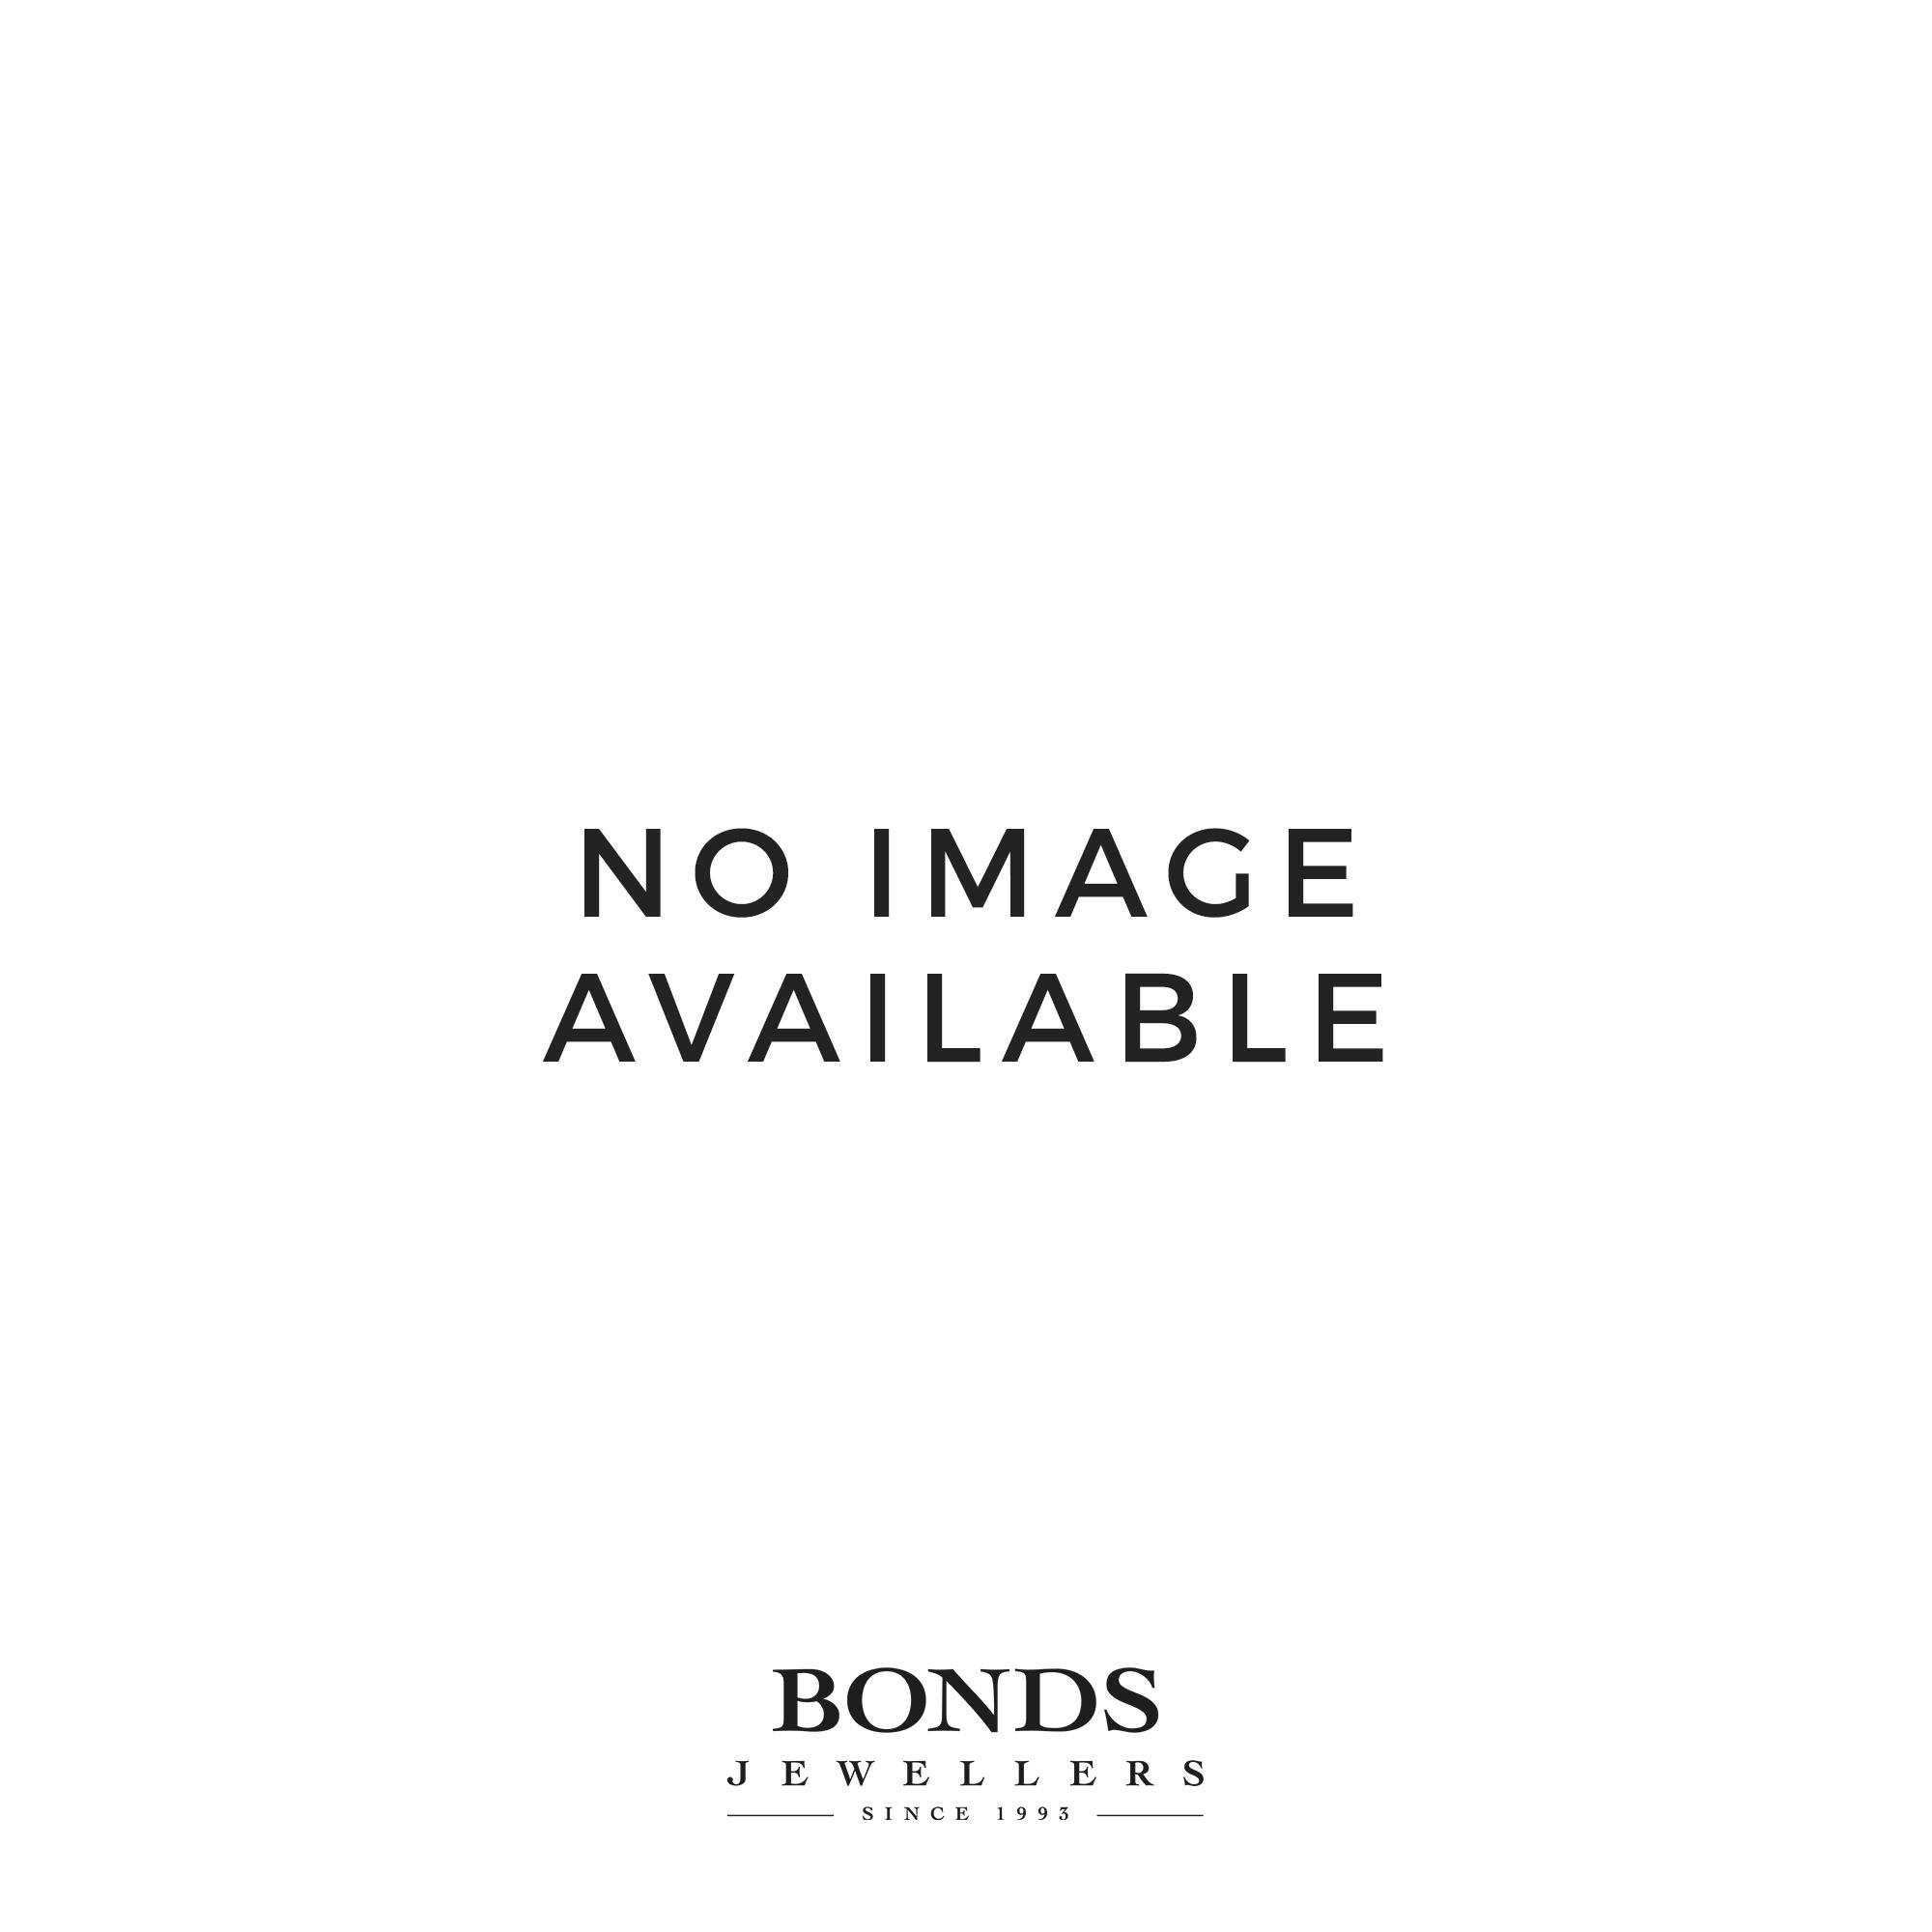 58f5cad8c Ted baker Kate Rose Gold Ladies Watch Mesh Bracelet ¦ bonds jewellers